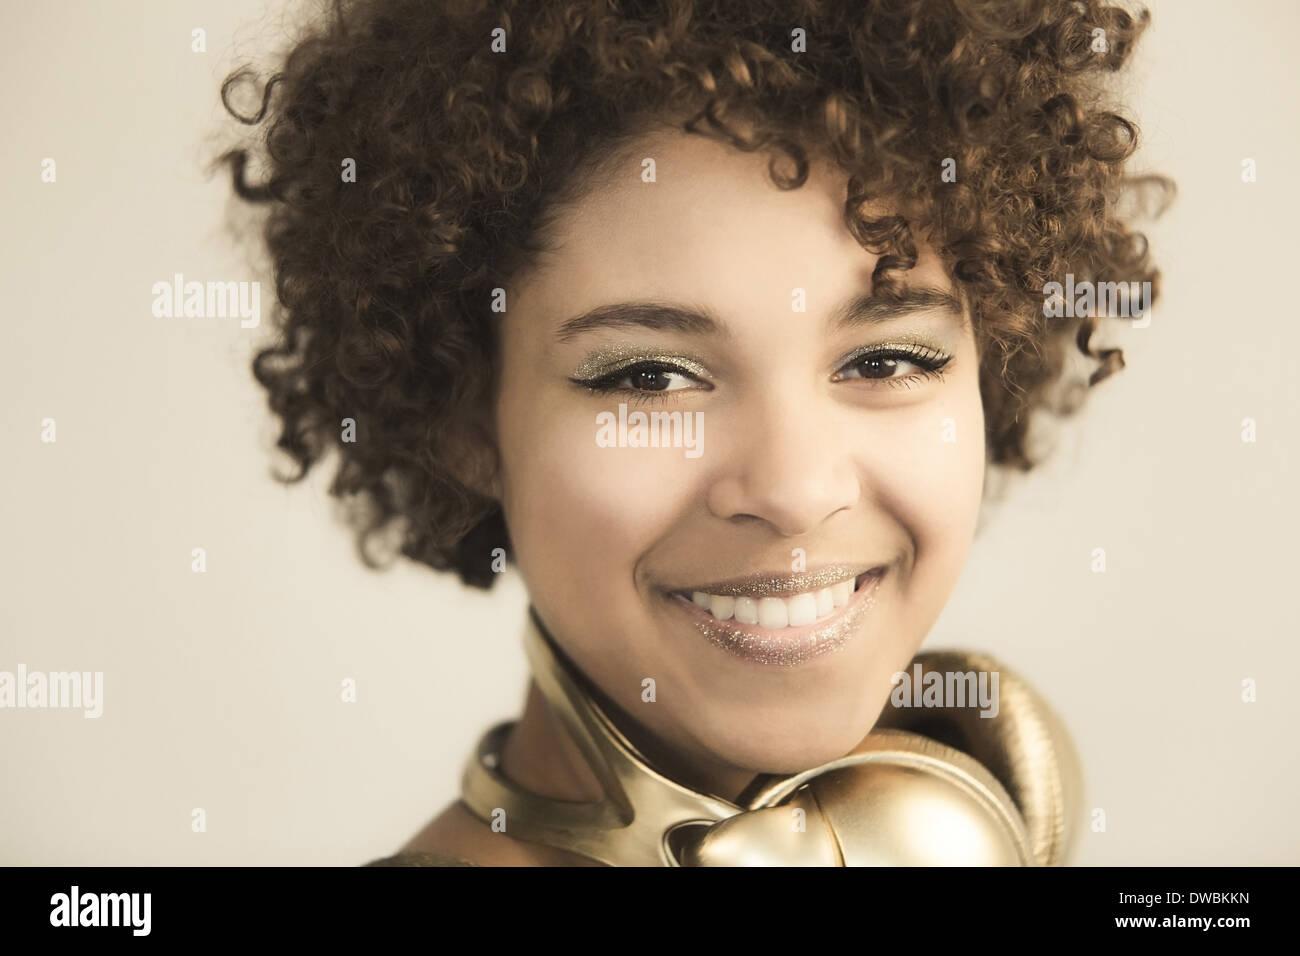 Retrato de mujeres afroamericanas con auriculares Imagen De Stock